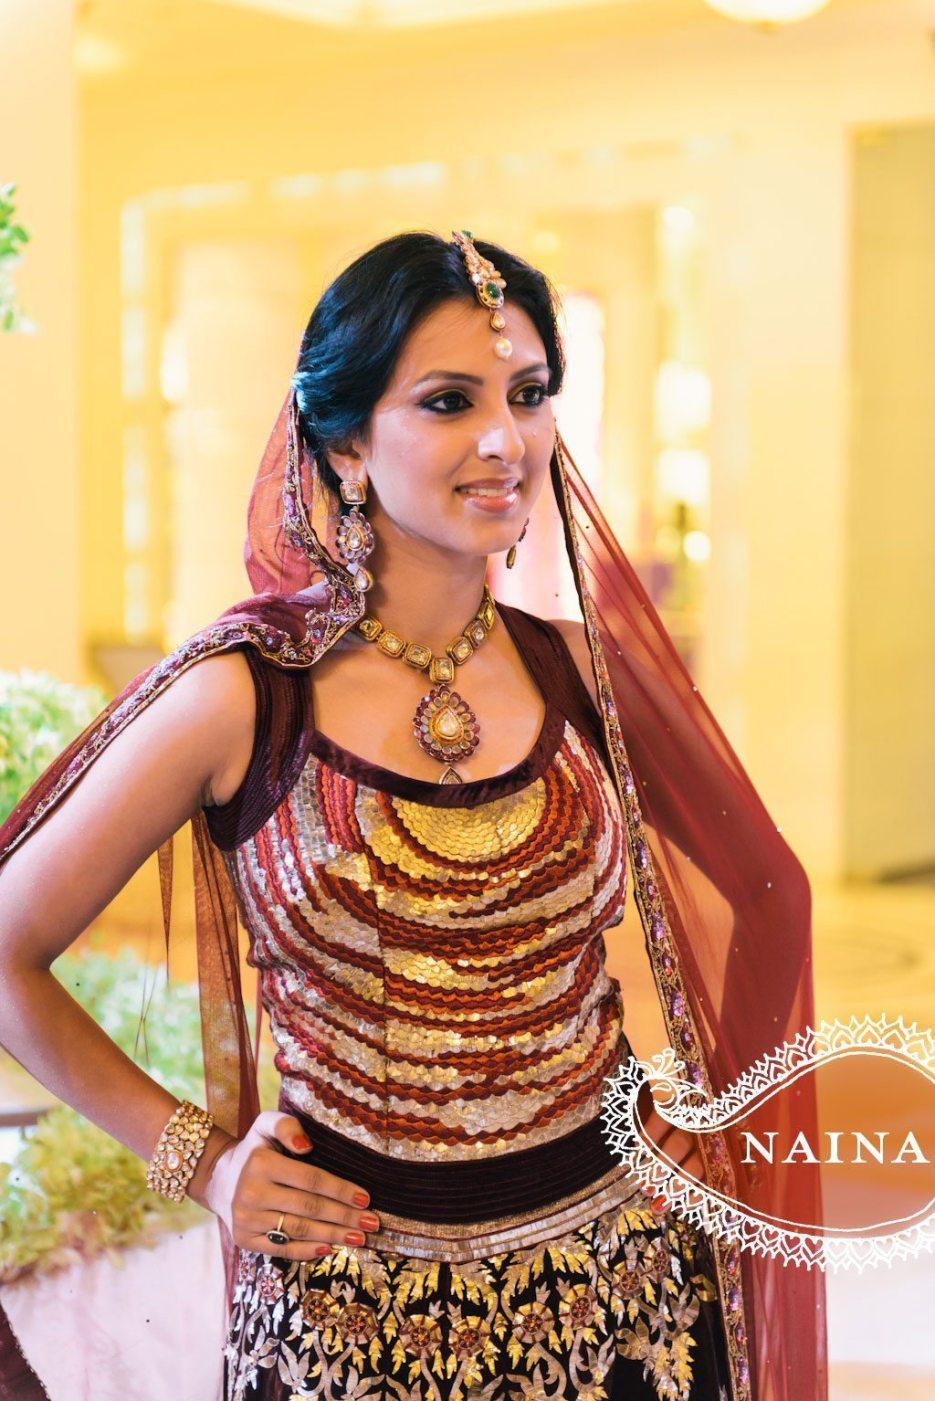 Naina-Knottytales-Professional-Photographer-Wedding-Atelier-2012-62.jpg